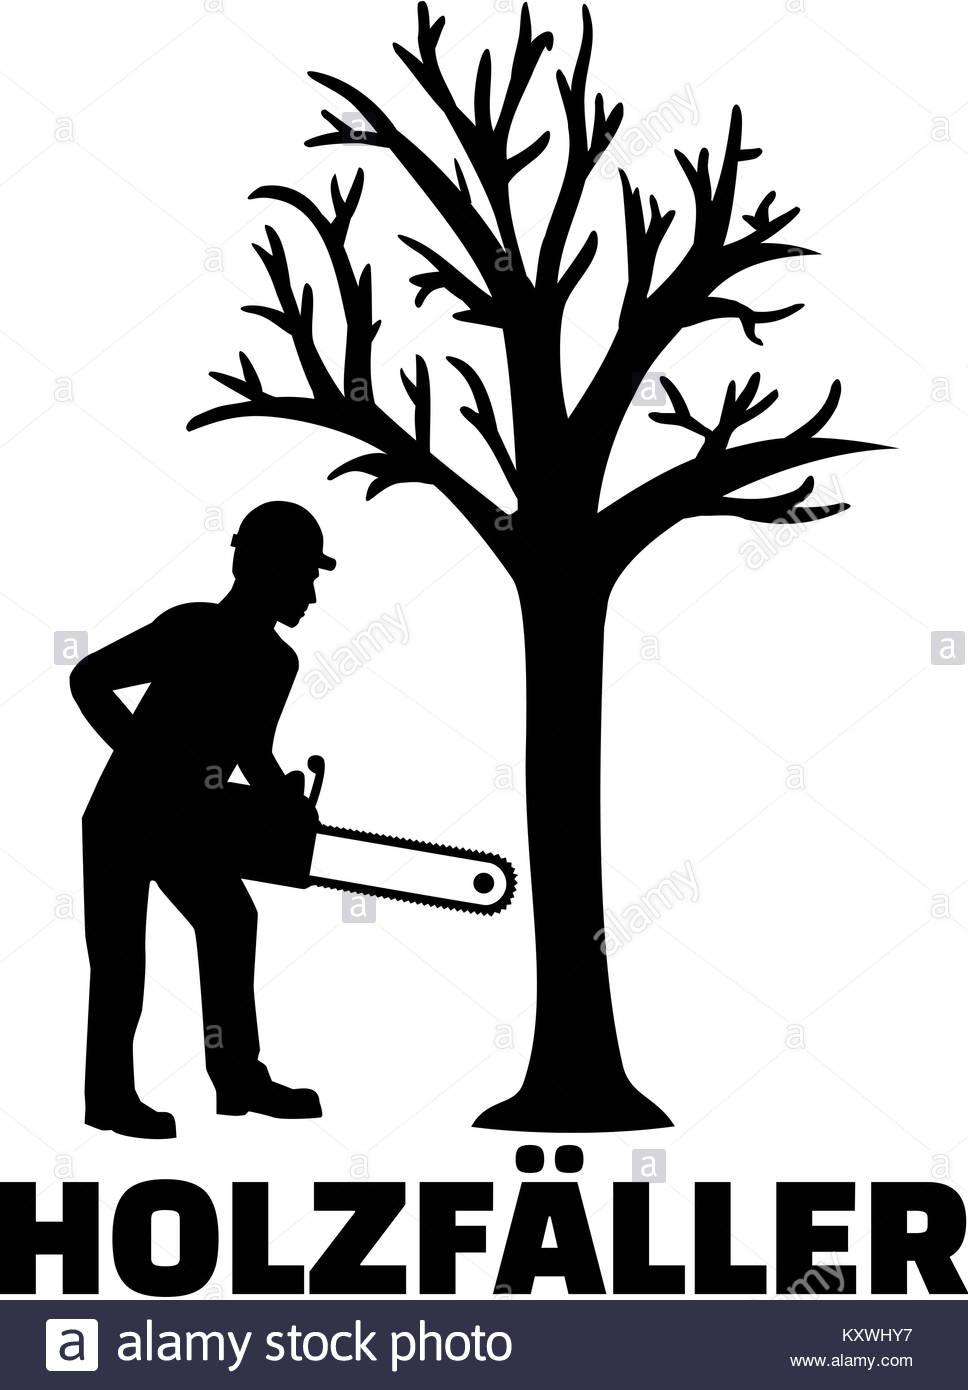 968x1390 Lumberjack German Job Title With Silhouette Stock Photo 171437259